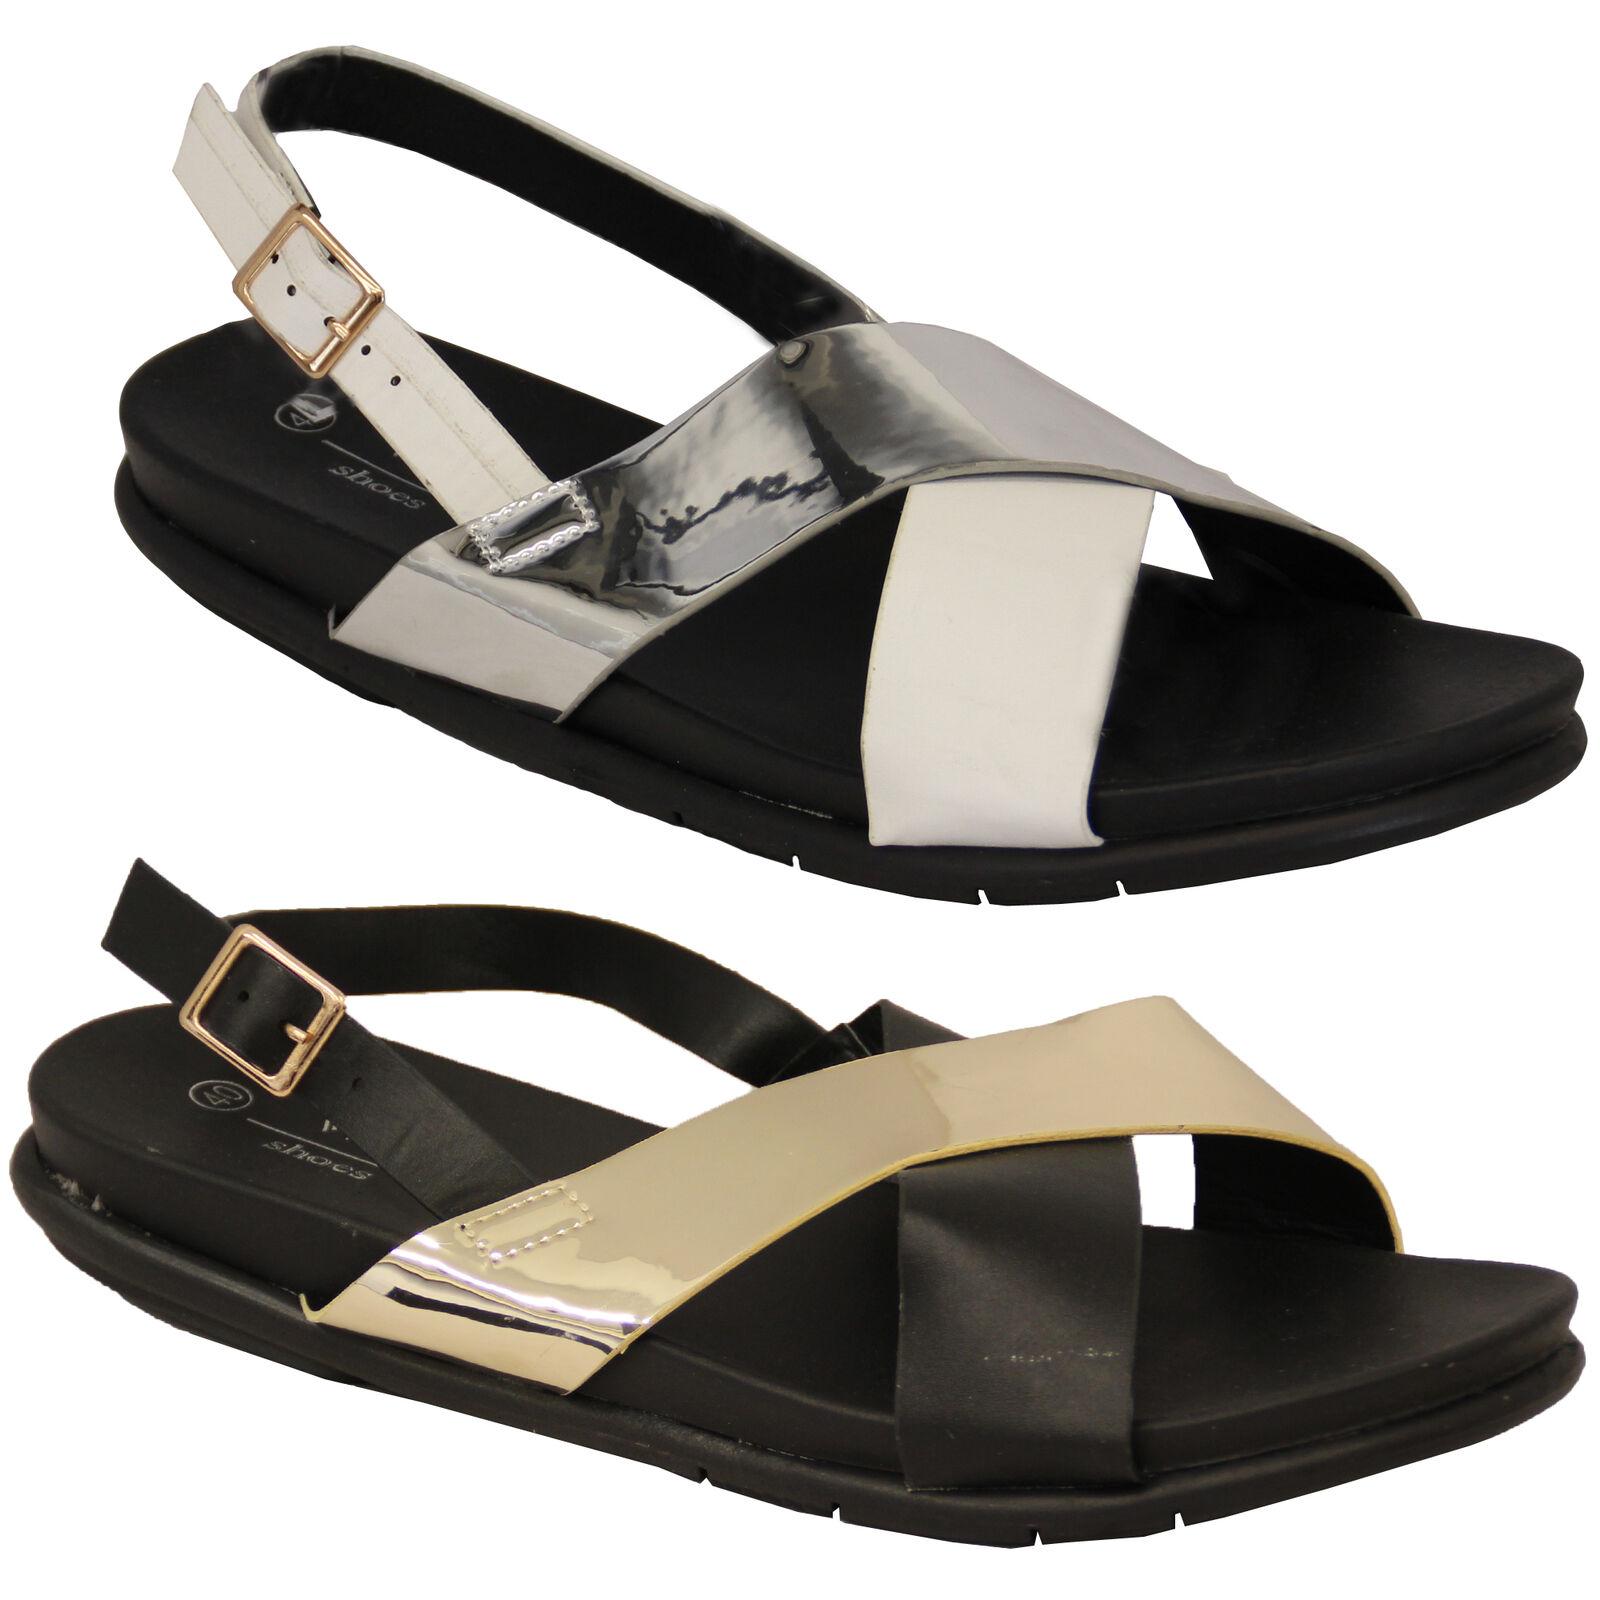 Sandalias Zapatos Mujer Peep Toe Plana Tira Trasera Hebilla Zapatos Sandalias Informal a la Moda c41051